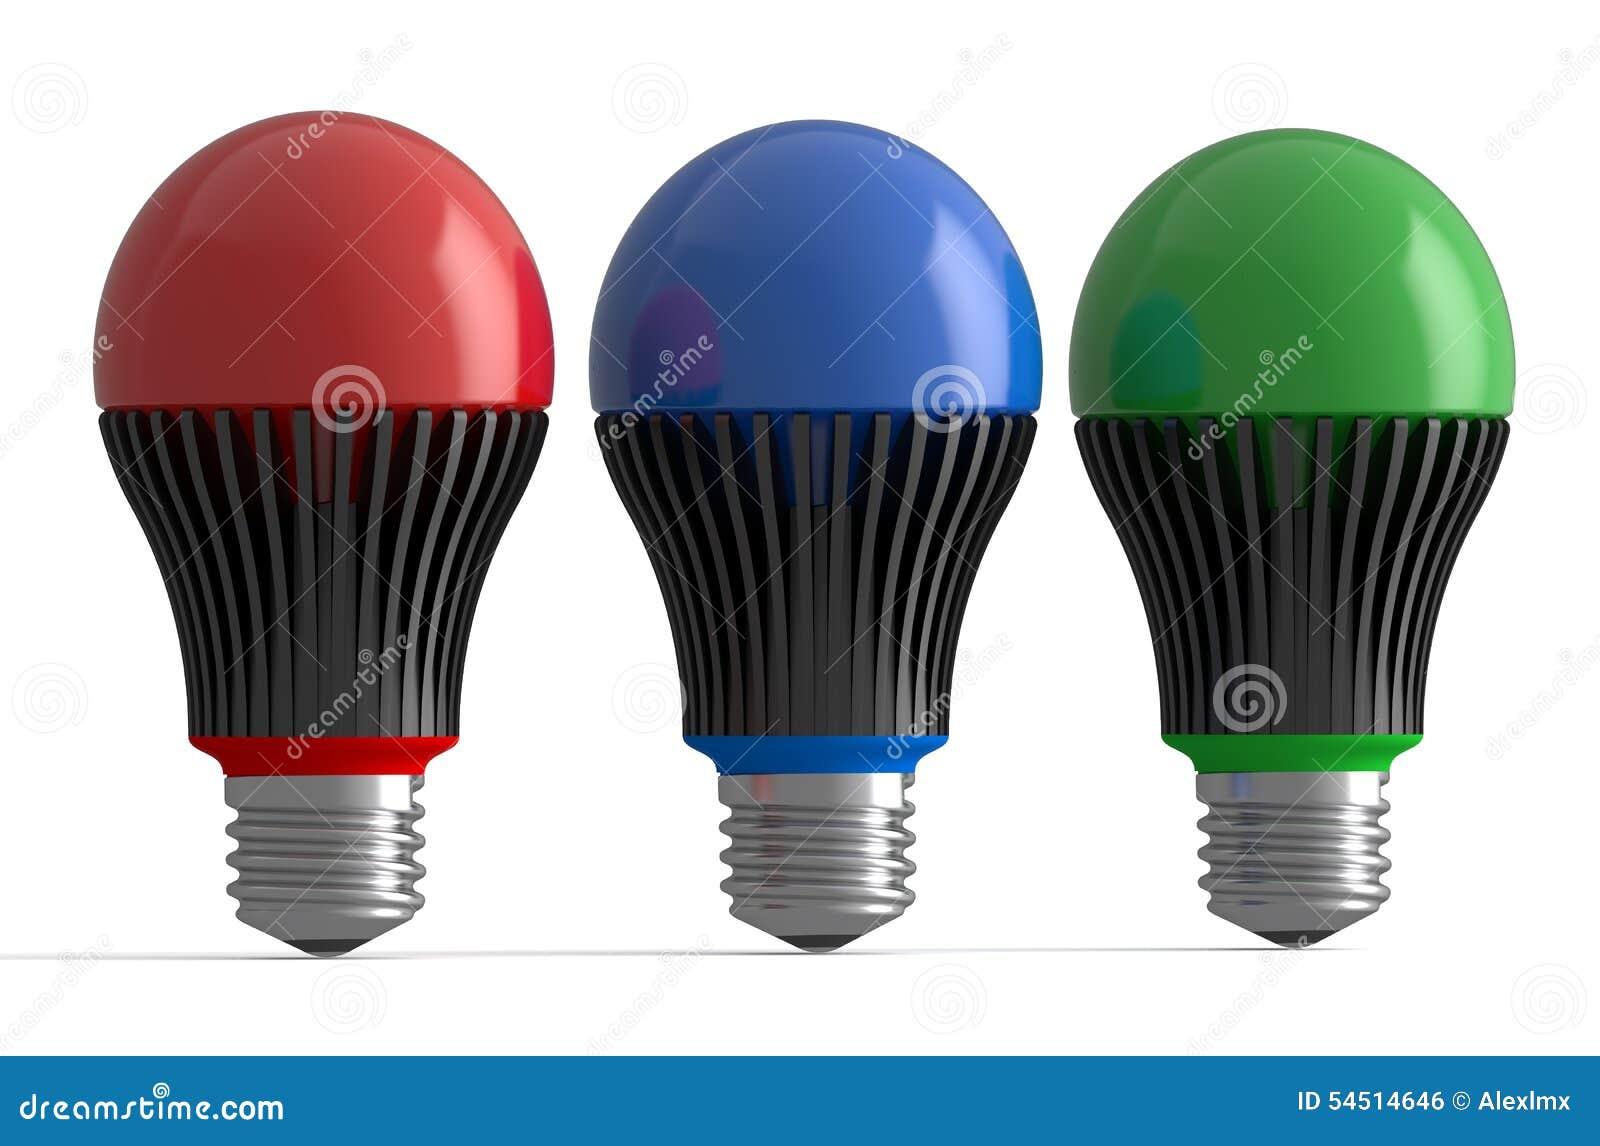 satz farbige led lampen stock abbildung illustration von gruppe 54514646. Black Bedroom Furniture Sets. Home Design Ideas